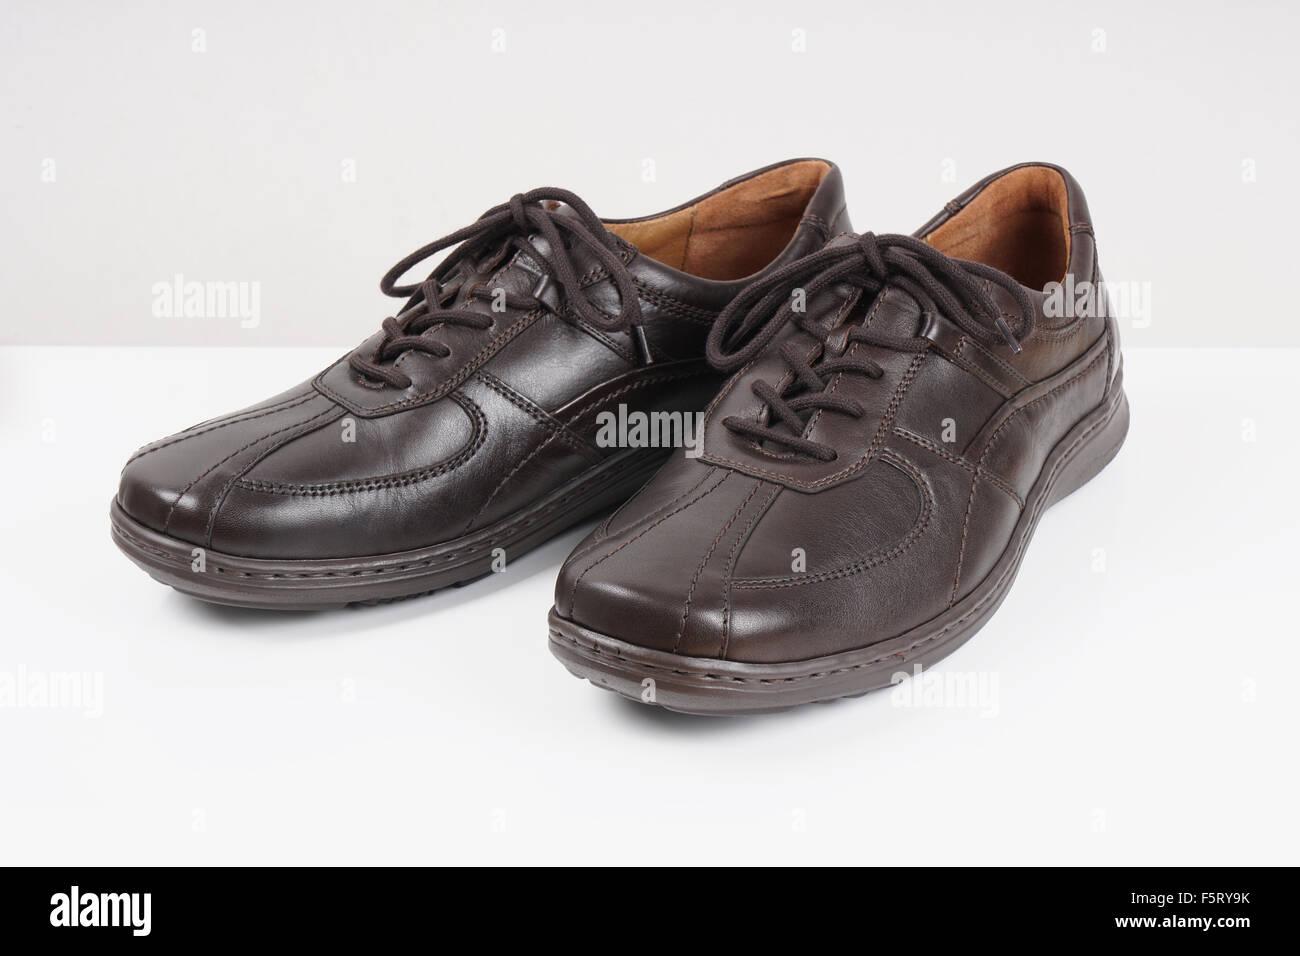 dark brown mens shoes Stock Photo: 89651455 Alamy